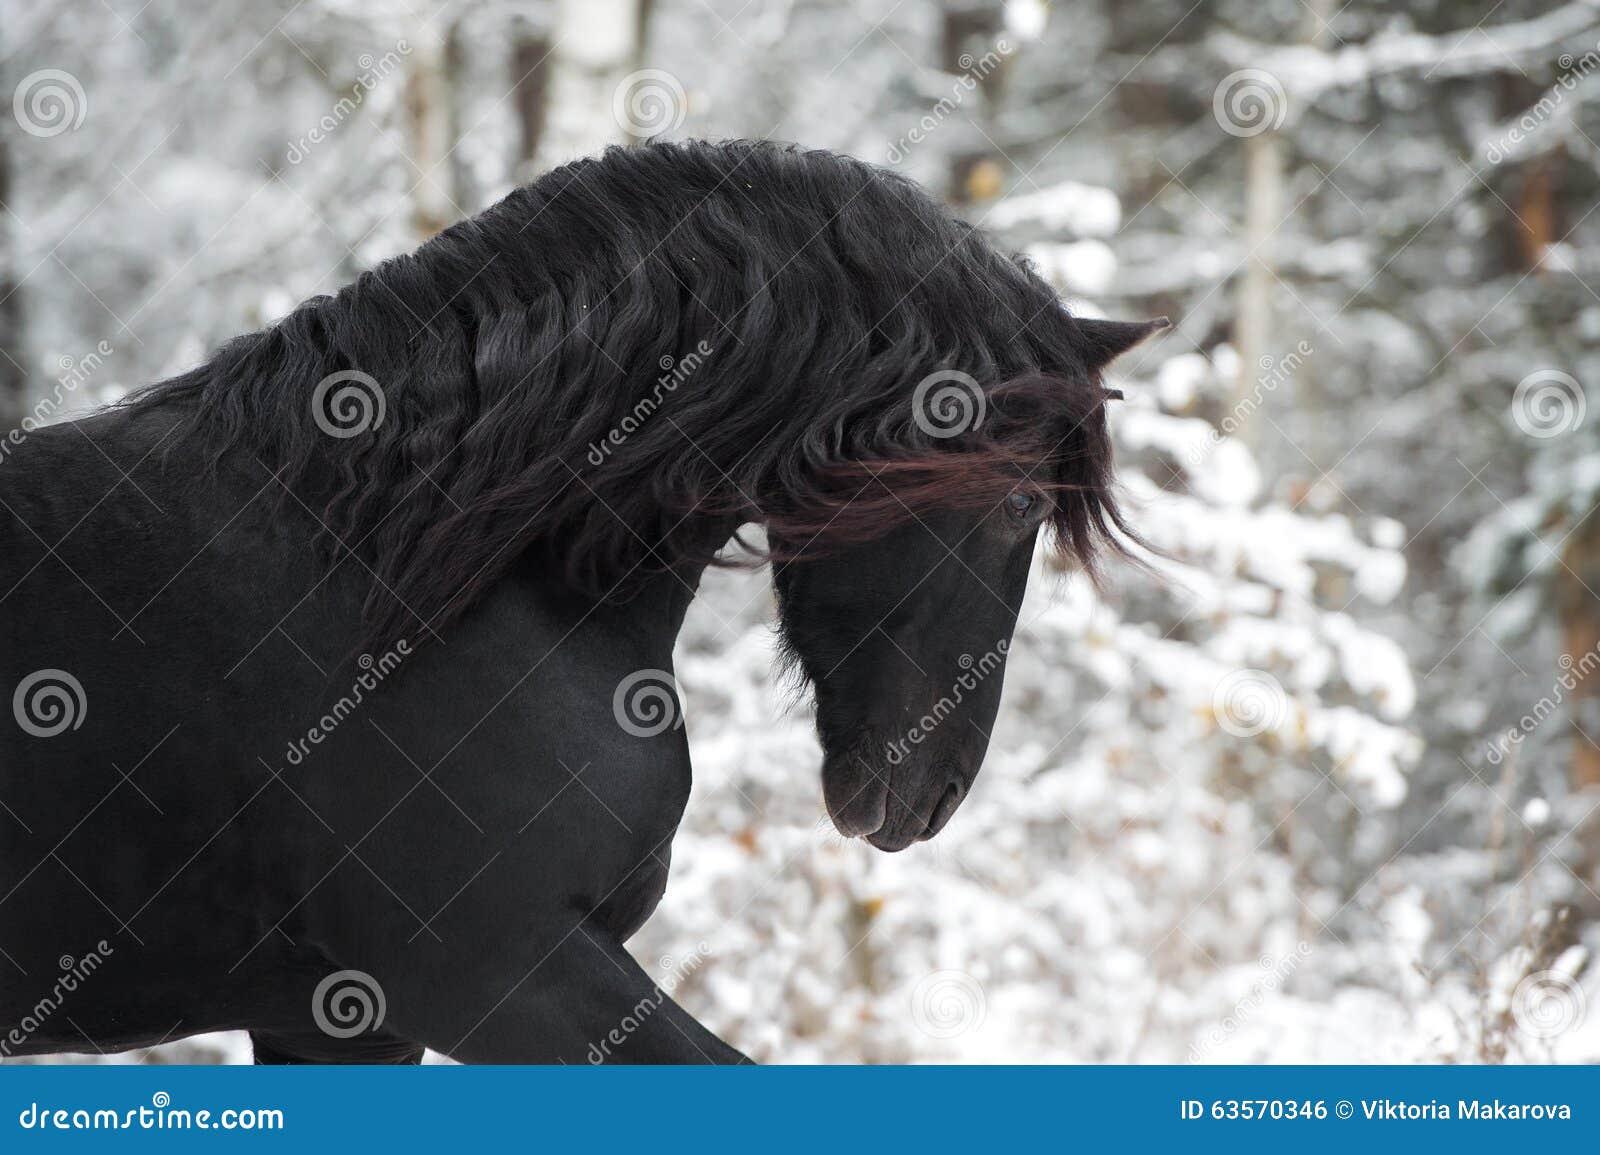 Portrait of black Friesian horse on winter background